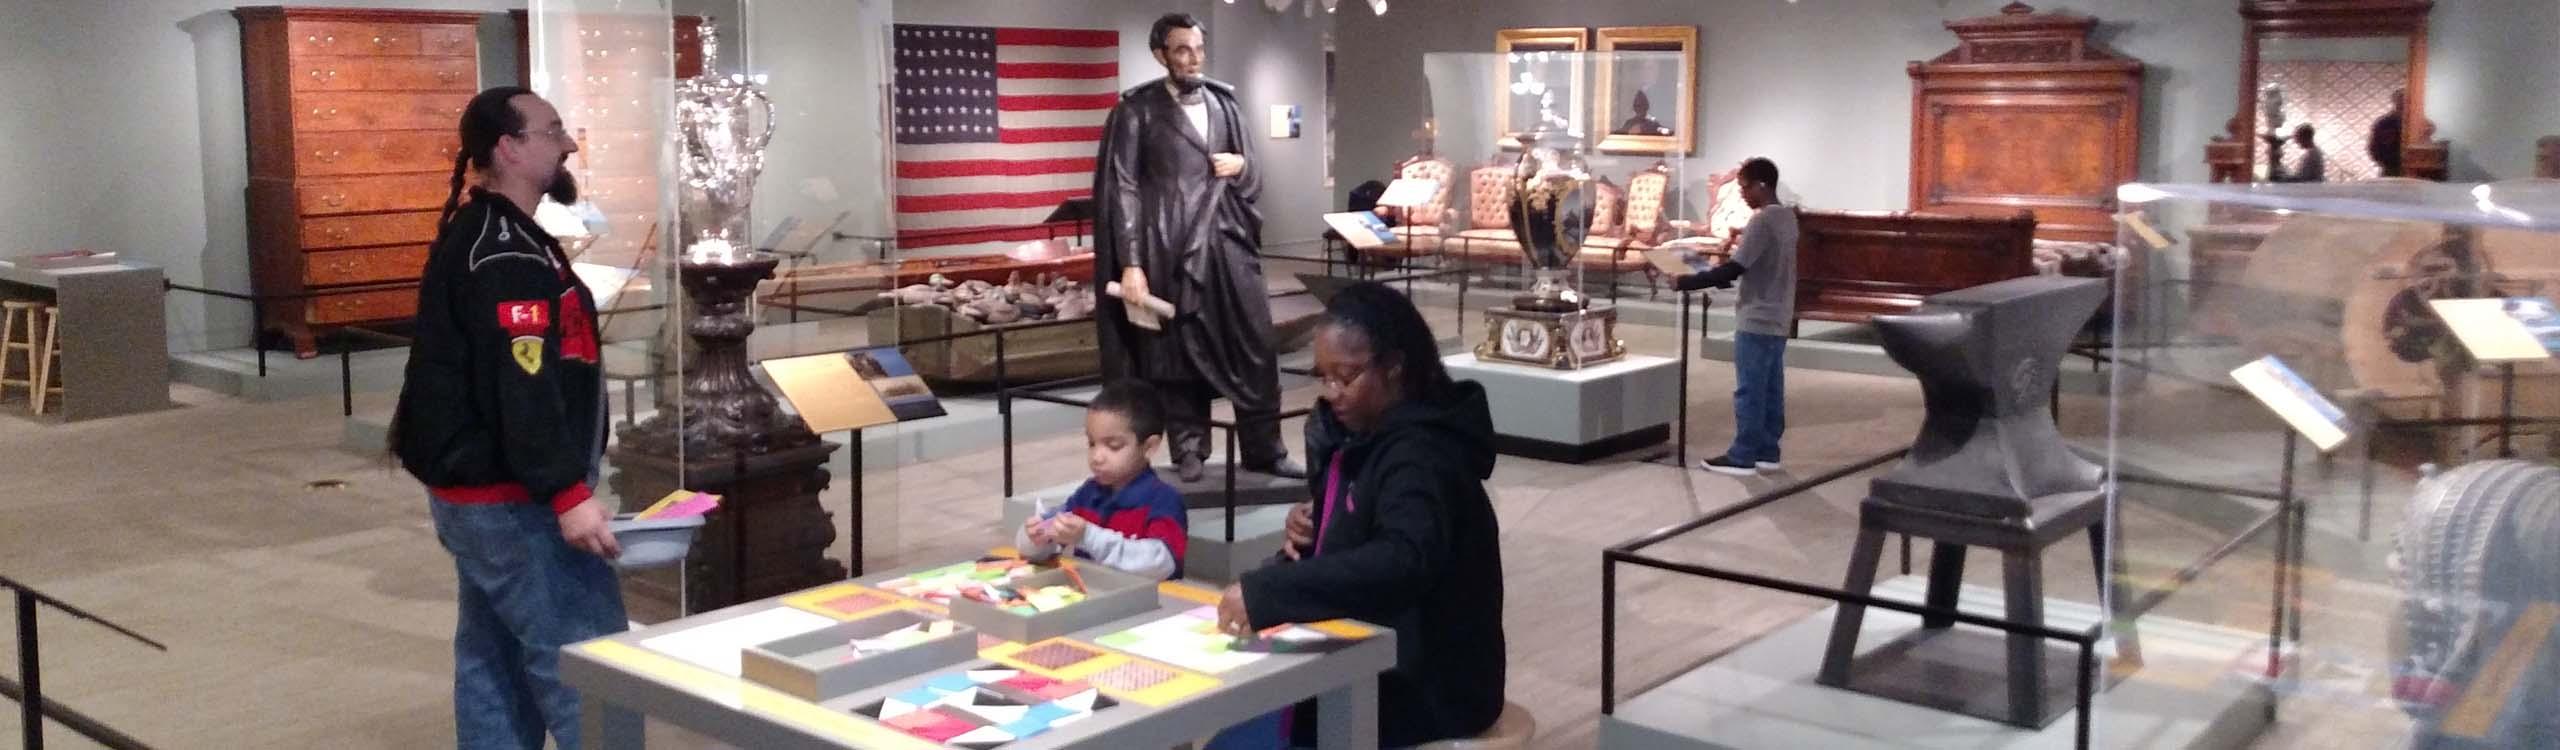 Nj Dos Nj State Museum Visit